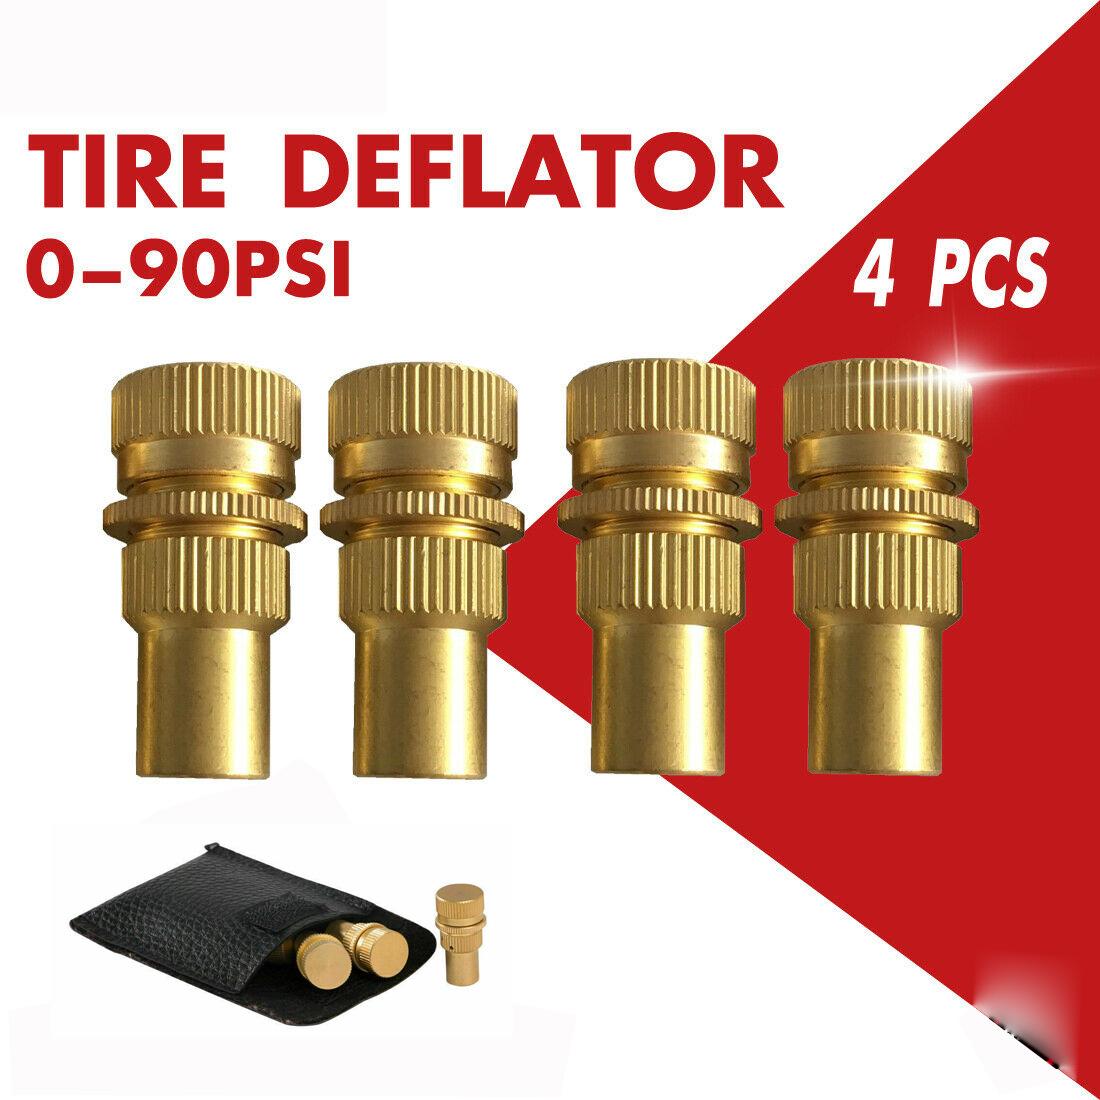 4pcs Brass Tire Deflators Kit Adjustable Automatic Tyre Deflator 0-90psi 4pcs